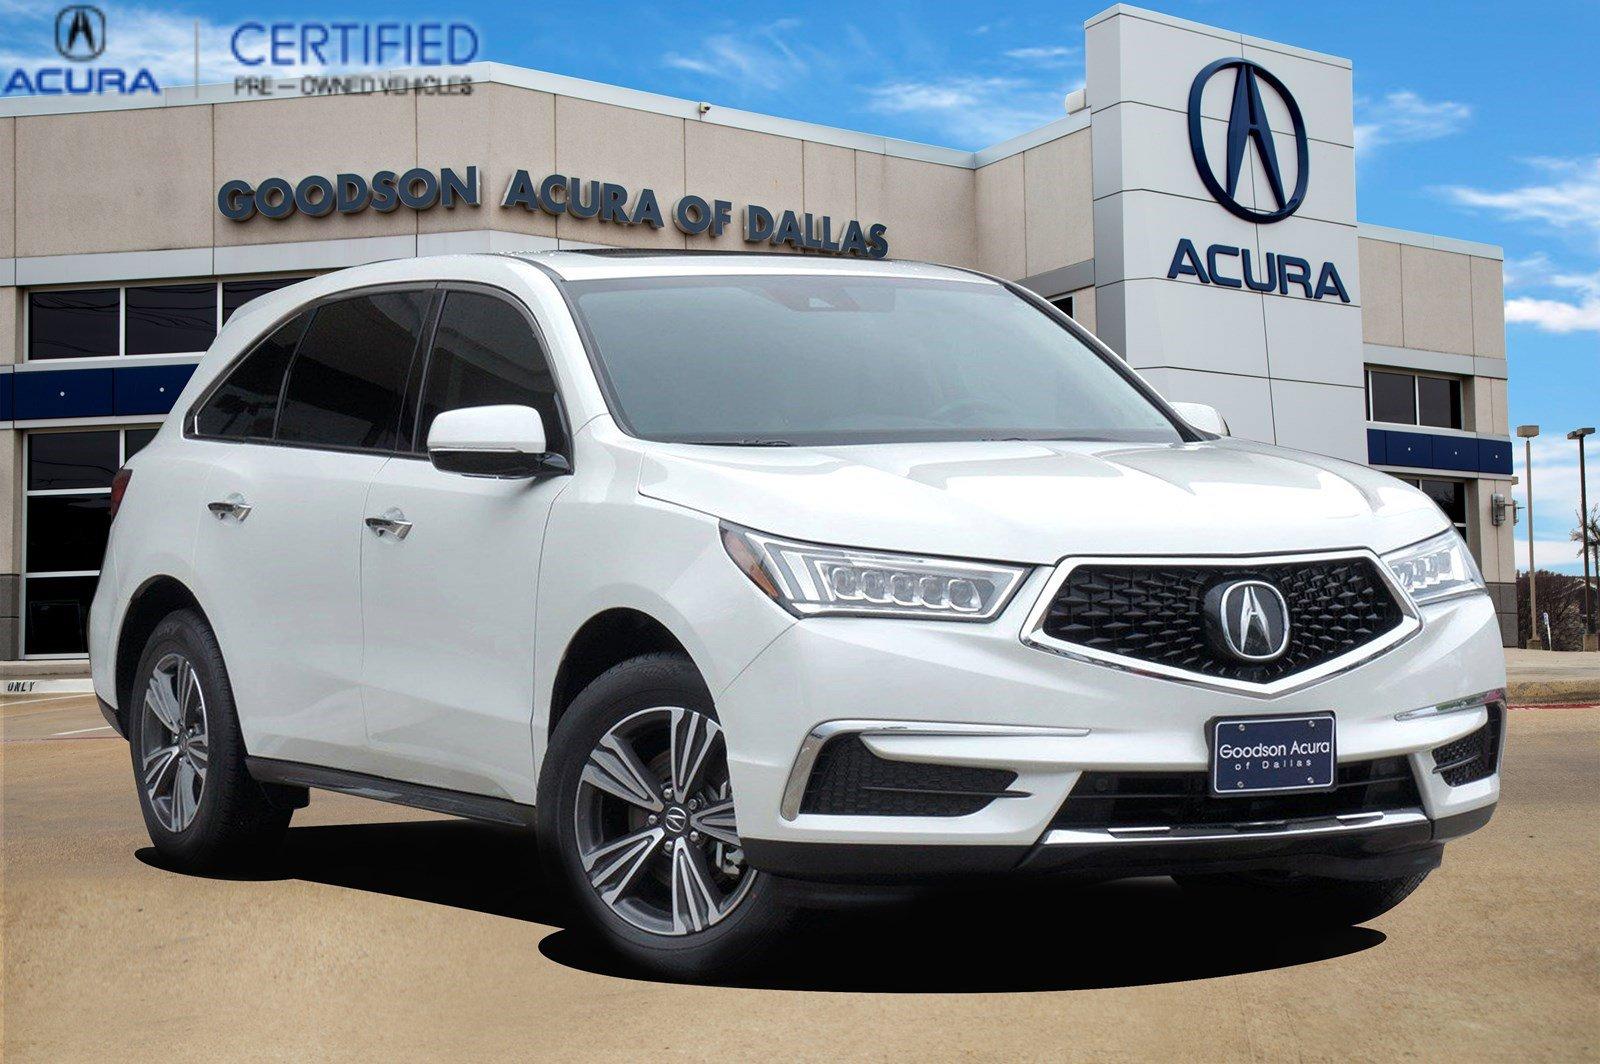 2017 Acura MDX FWD image